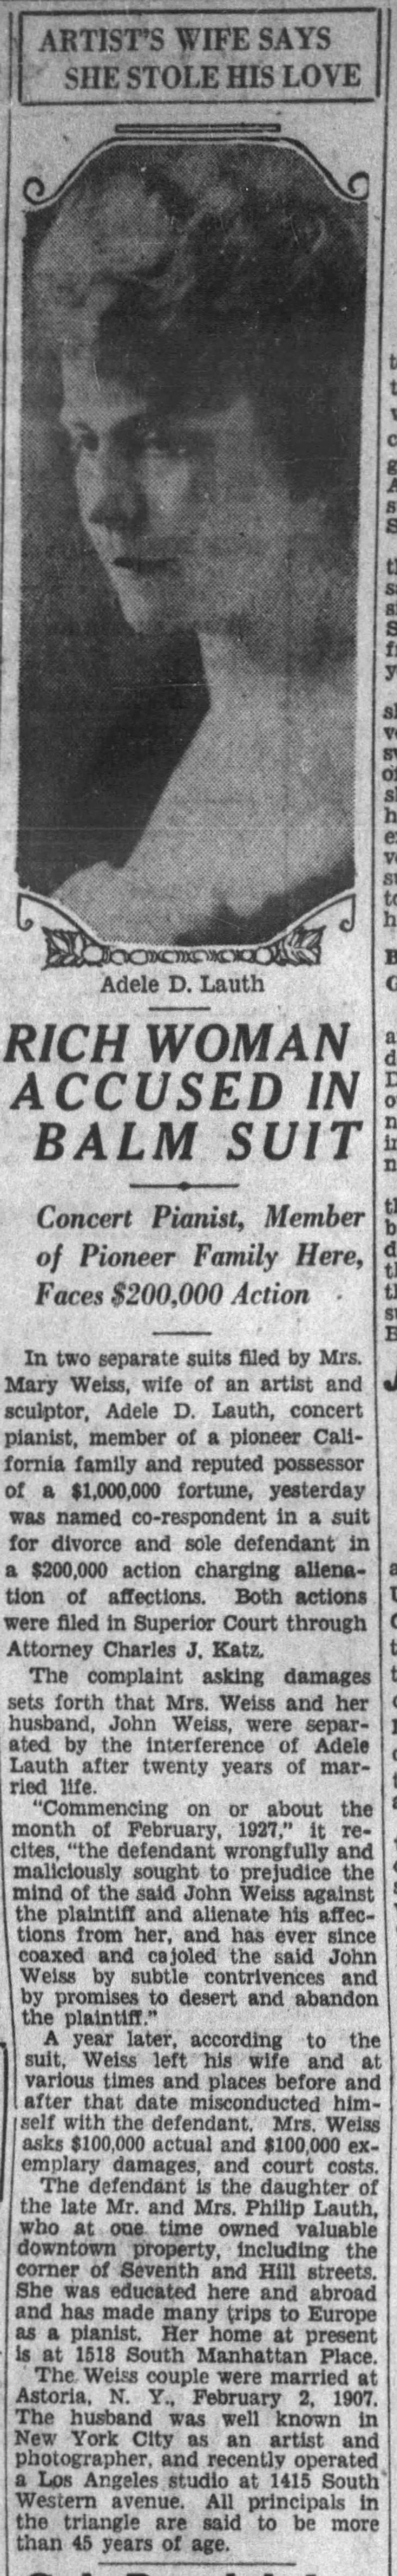 Adele D Lauth heart balm suit The_Los_Angeles_Times_Fri__Jun_21__1929_